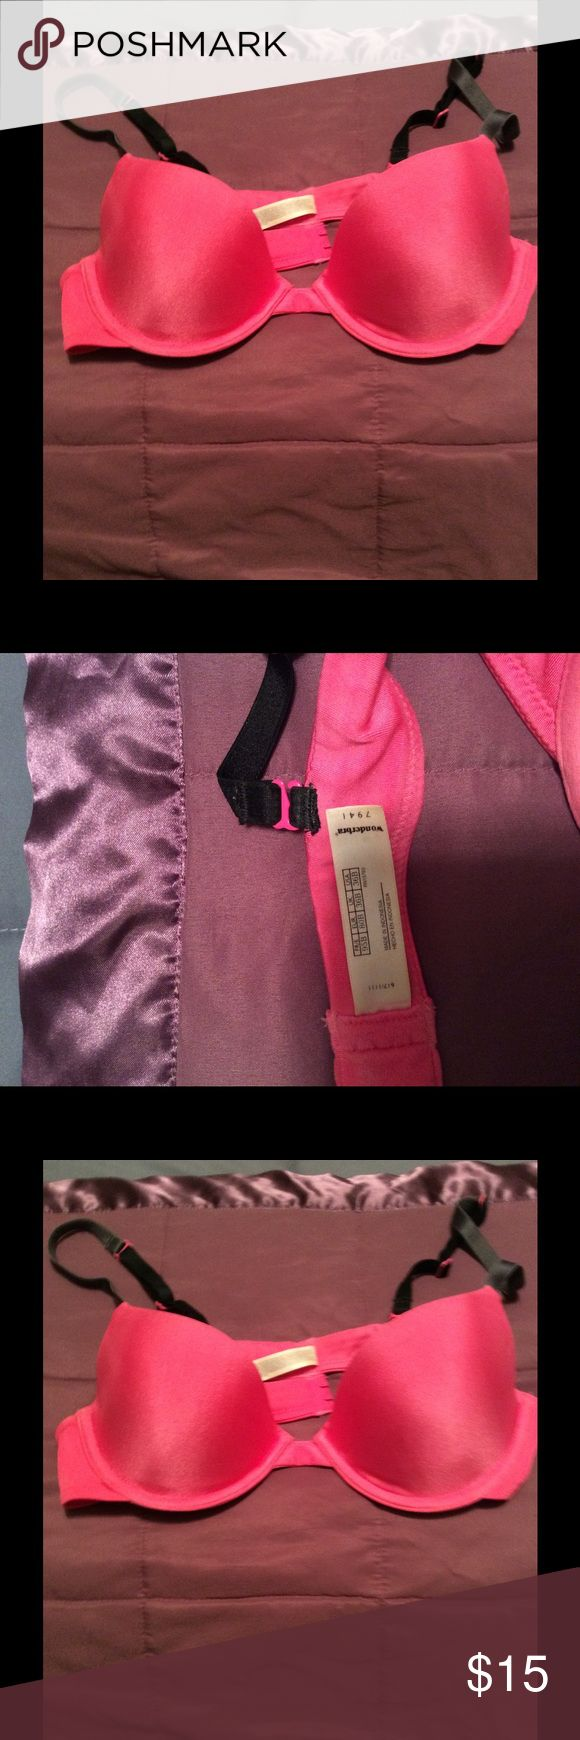 Pink Wonderbra push up New pink push up Wonder Bra wonderbra Intimates & Sleepwear Bras